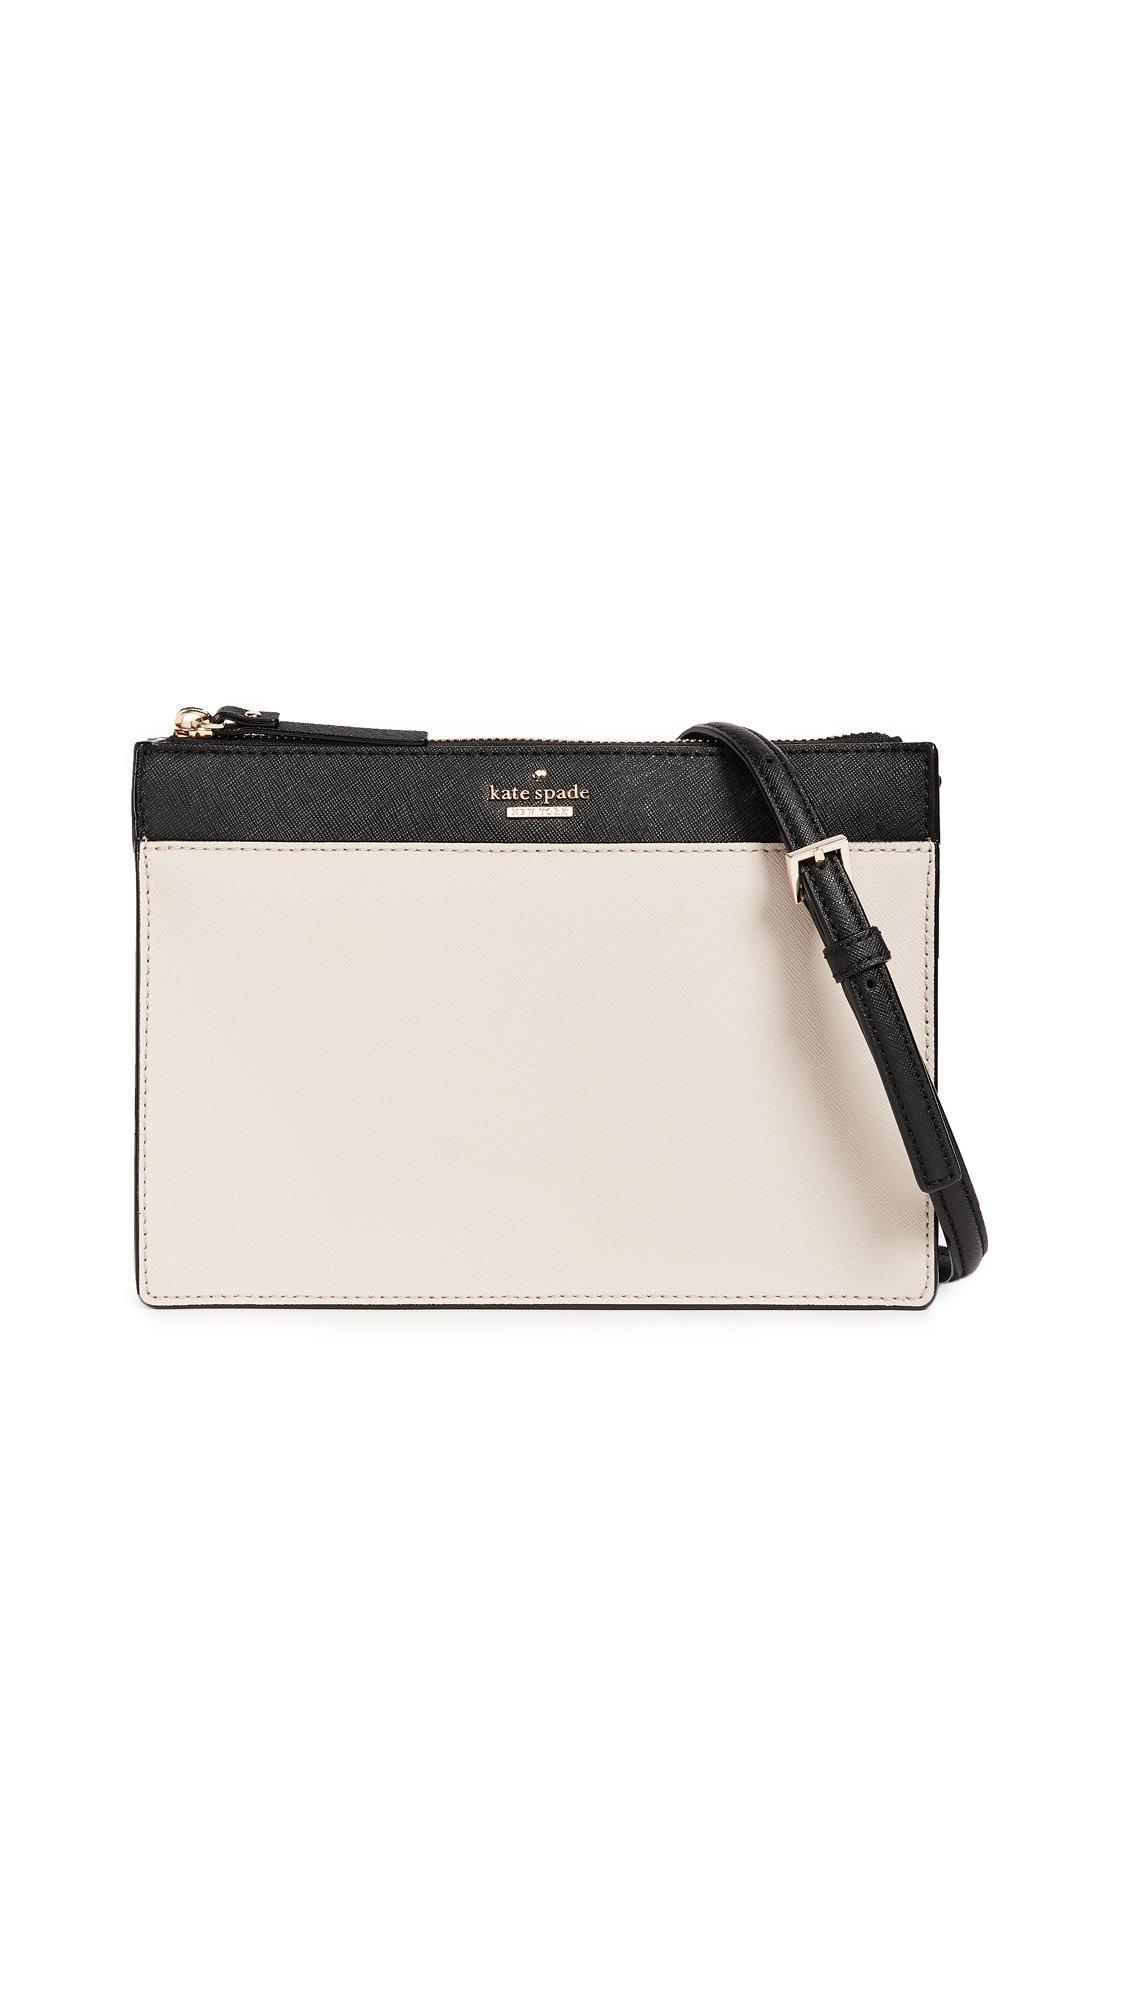 Kate Spade New York Women's Clarise Cross Body Bag, Tusk/Black, One Size